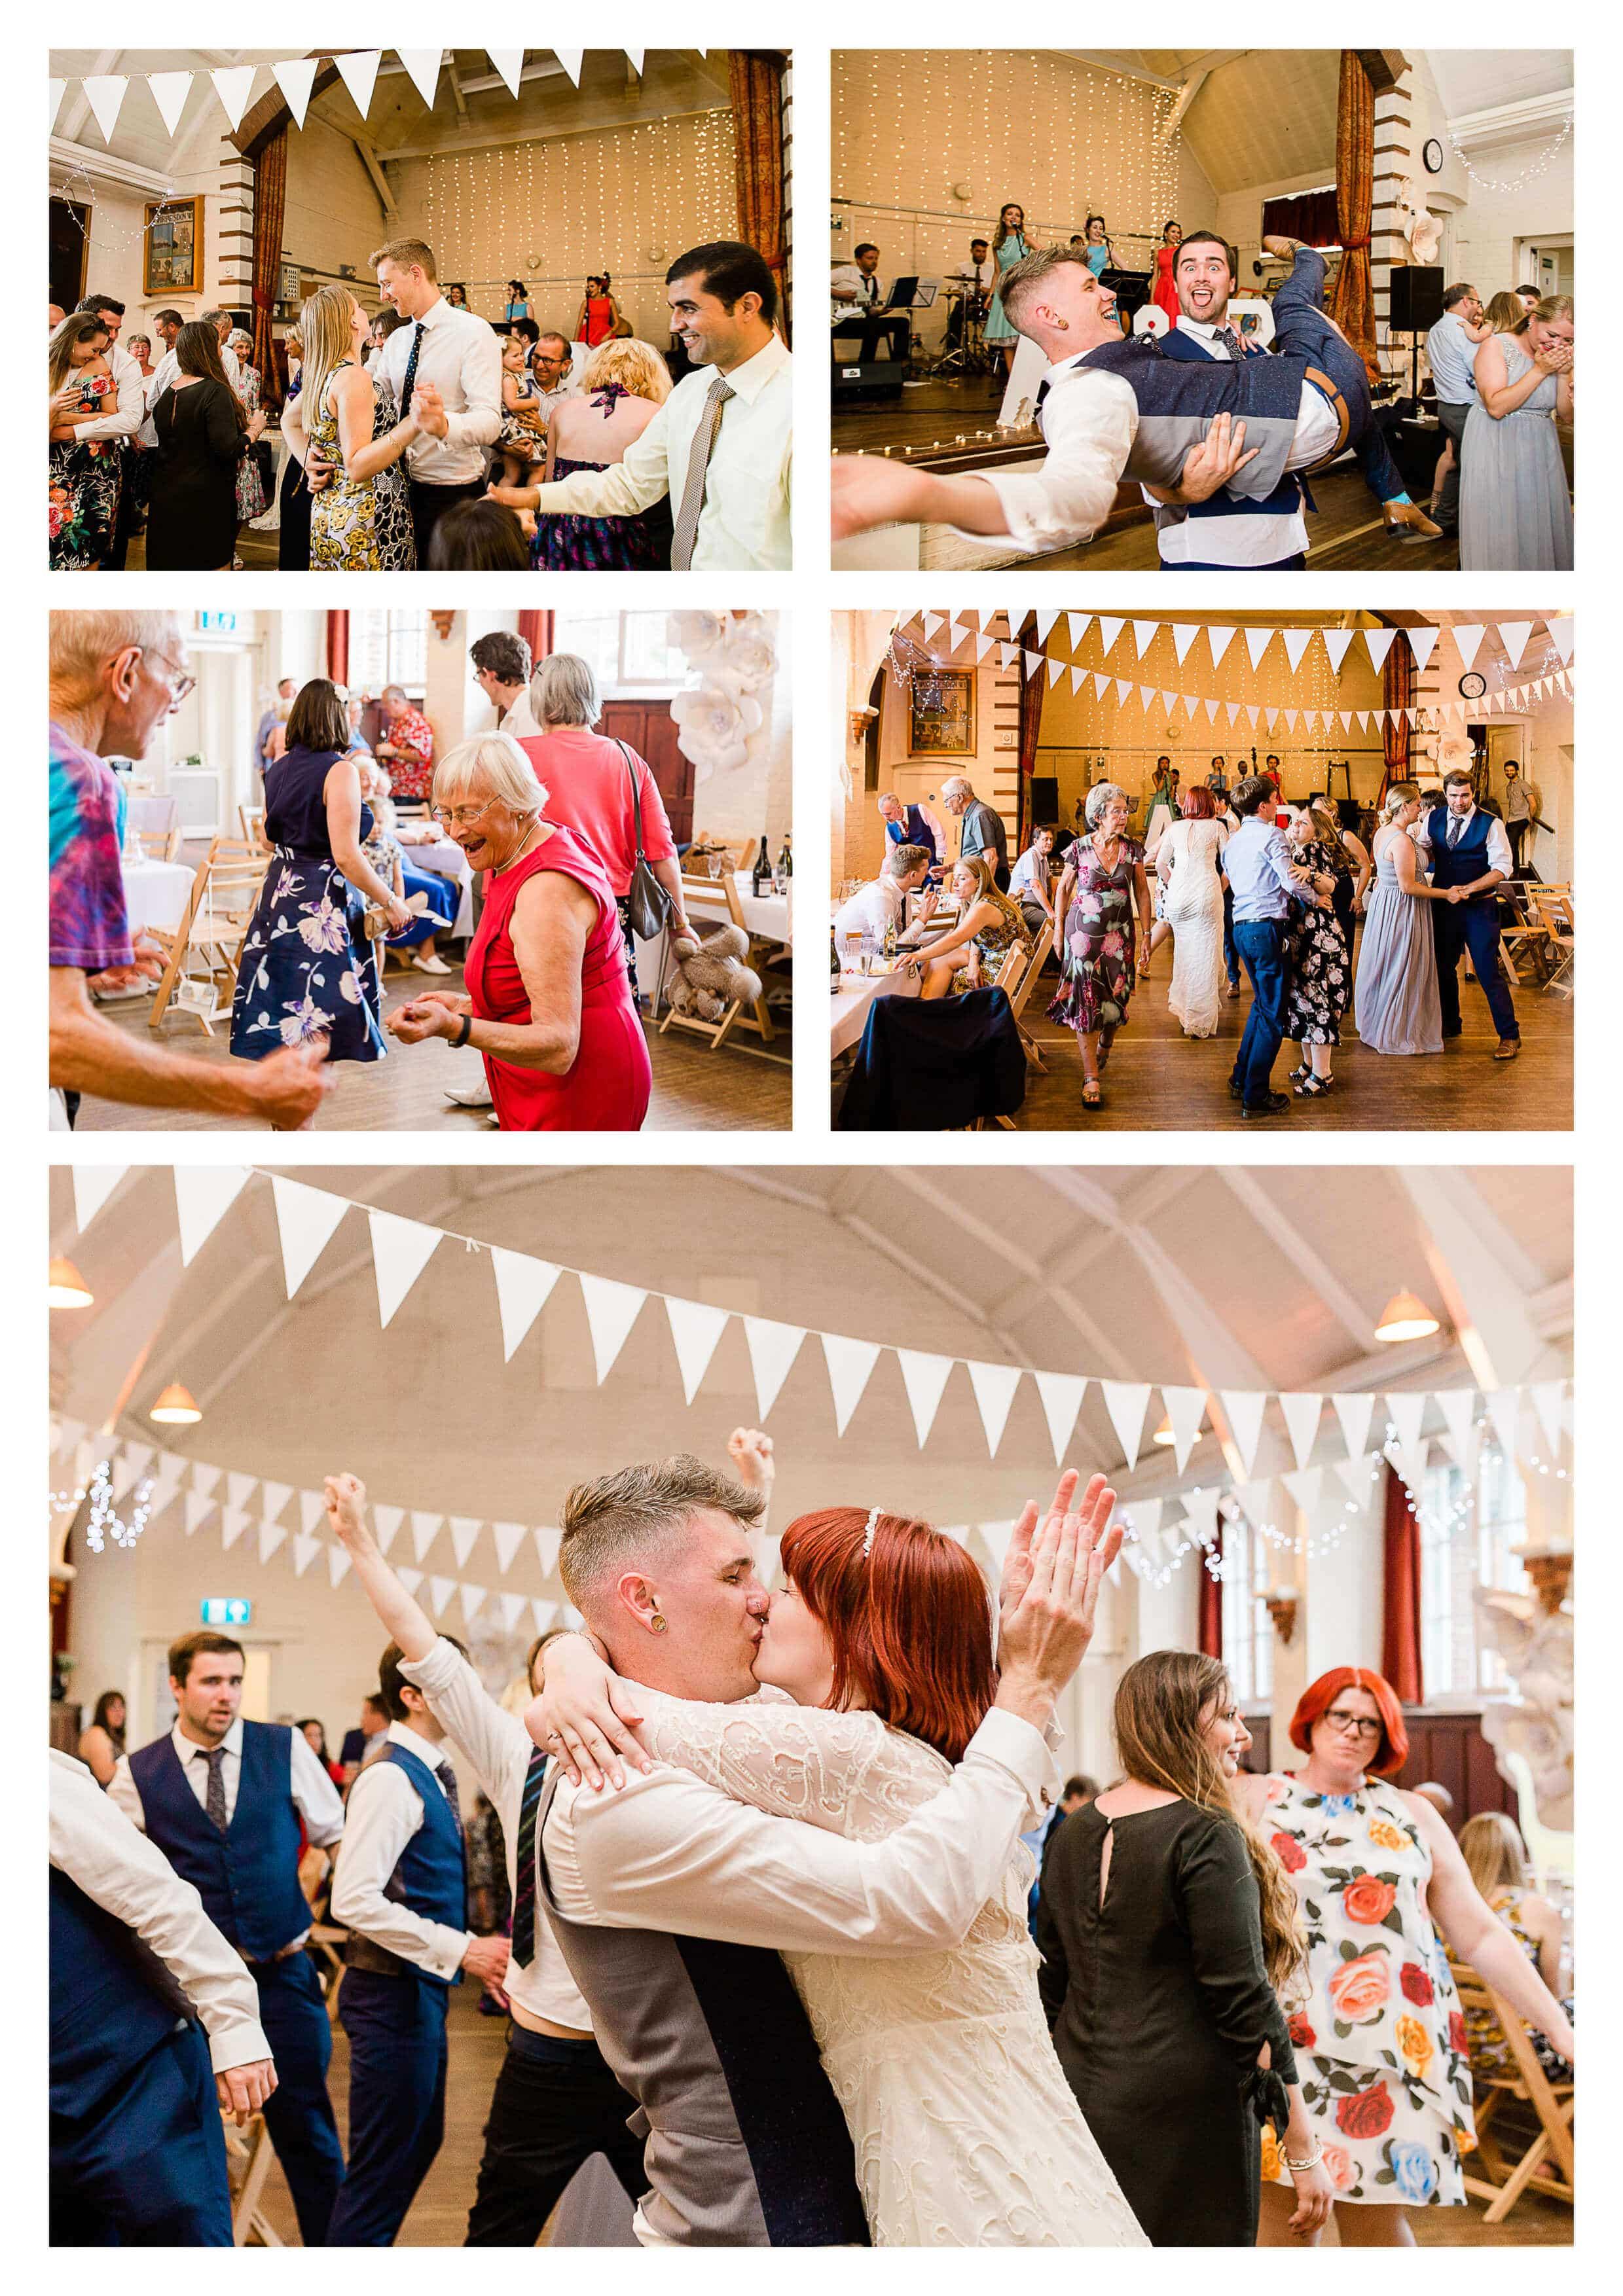 Worplesdon Memorial Hall wedding reception disco in Surrey | Guildford photographer